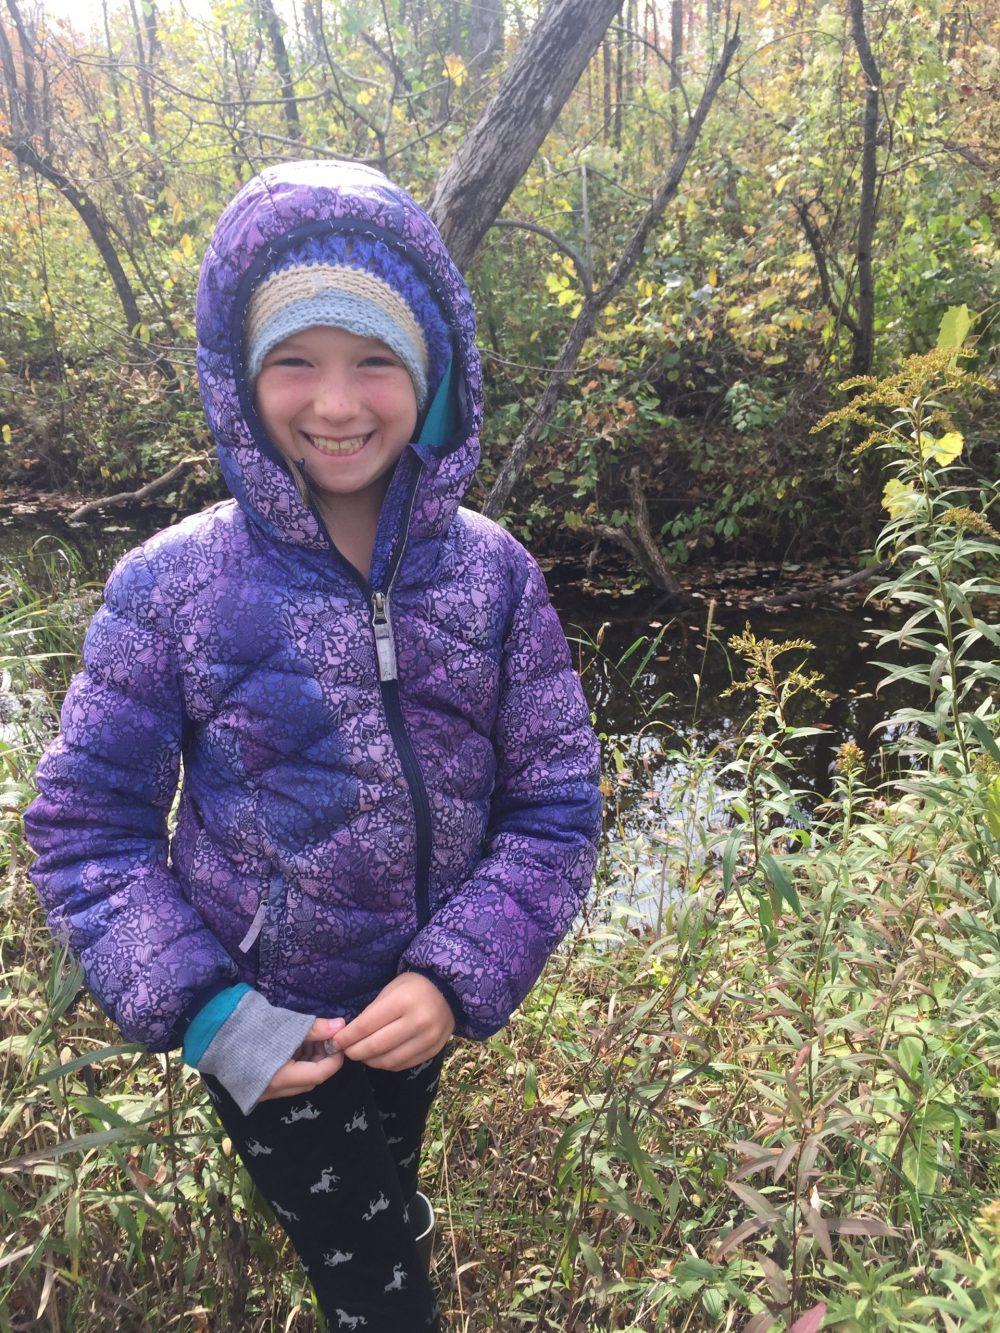 Sadie Courtney was inspired by the wetland habitat at Greenock Swamp.